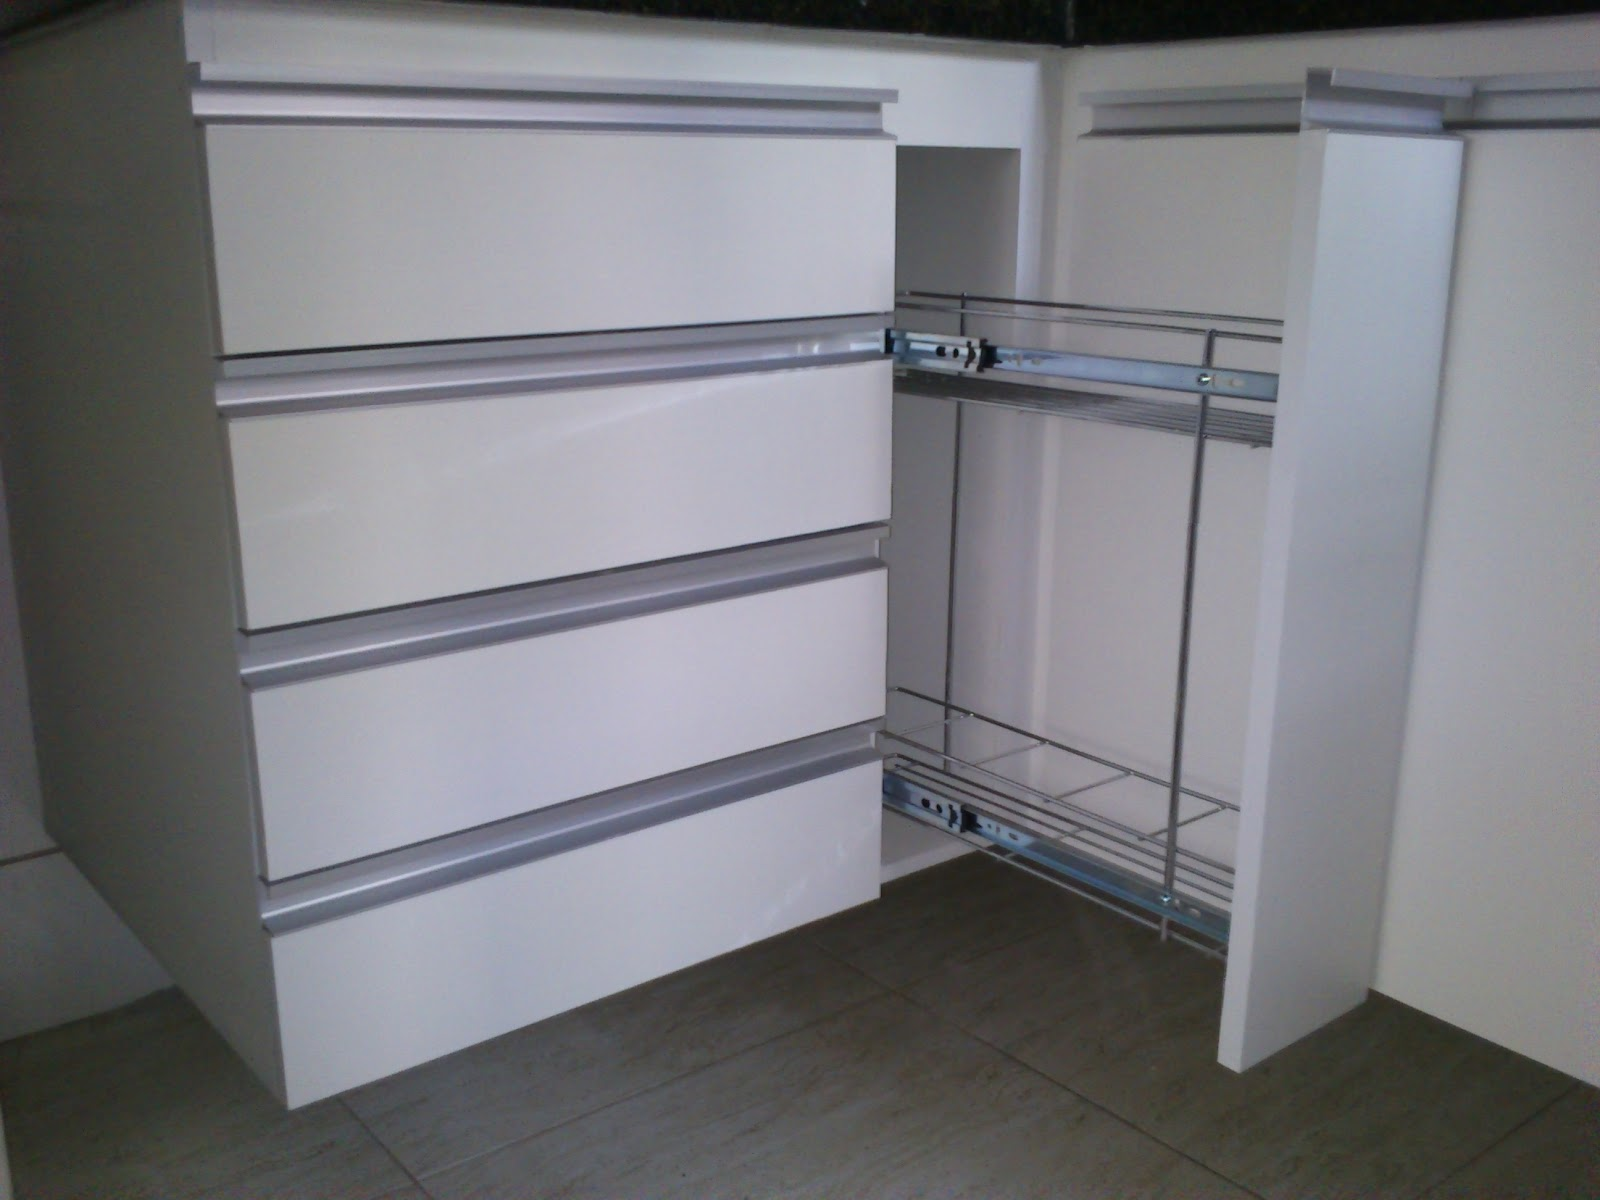 Leroy merlin armario de cozinha com pia - Armarios de resina leroy merlin ...